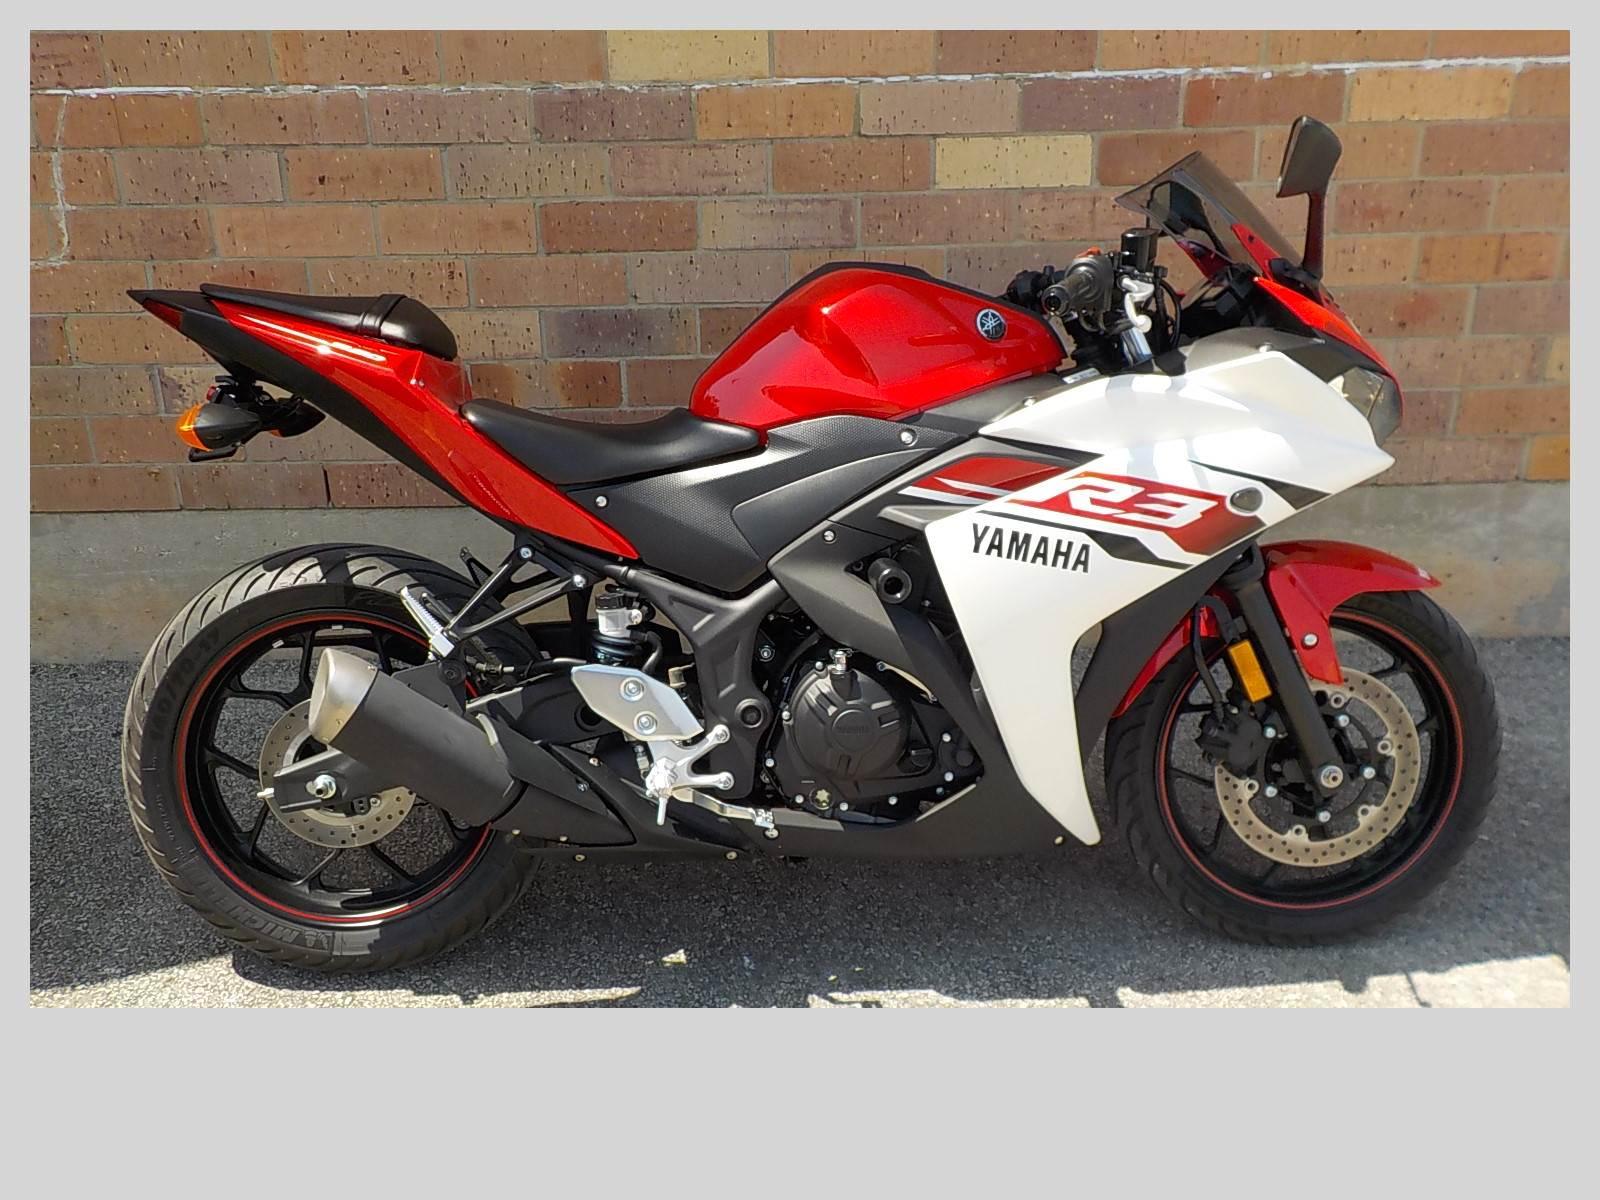 2015 Yamaha YZF-R3 for sale 147556